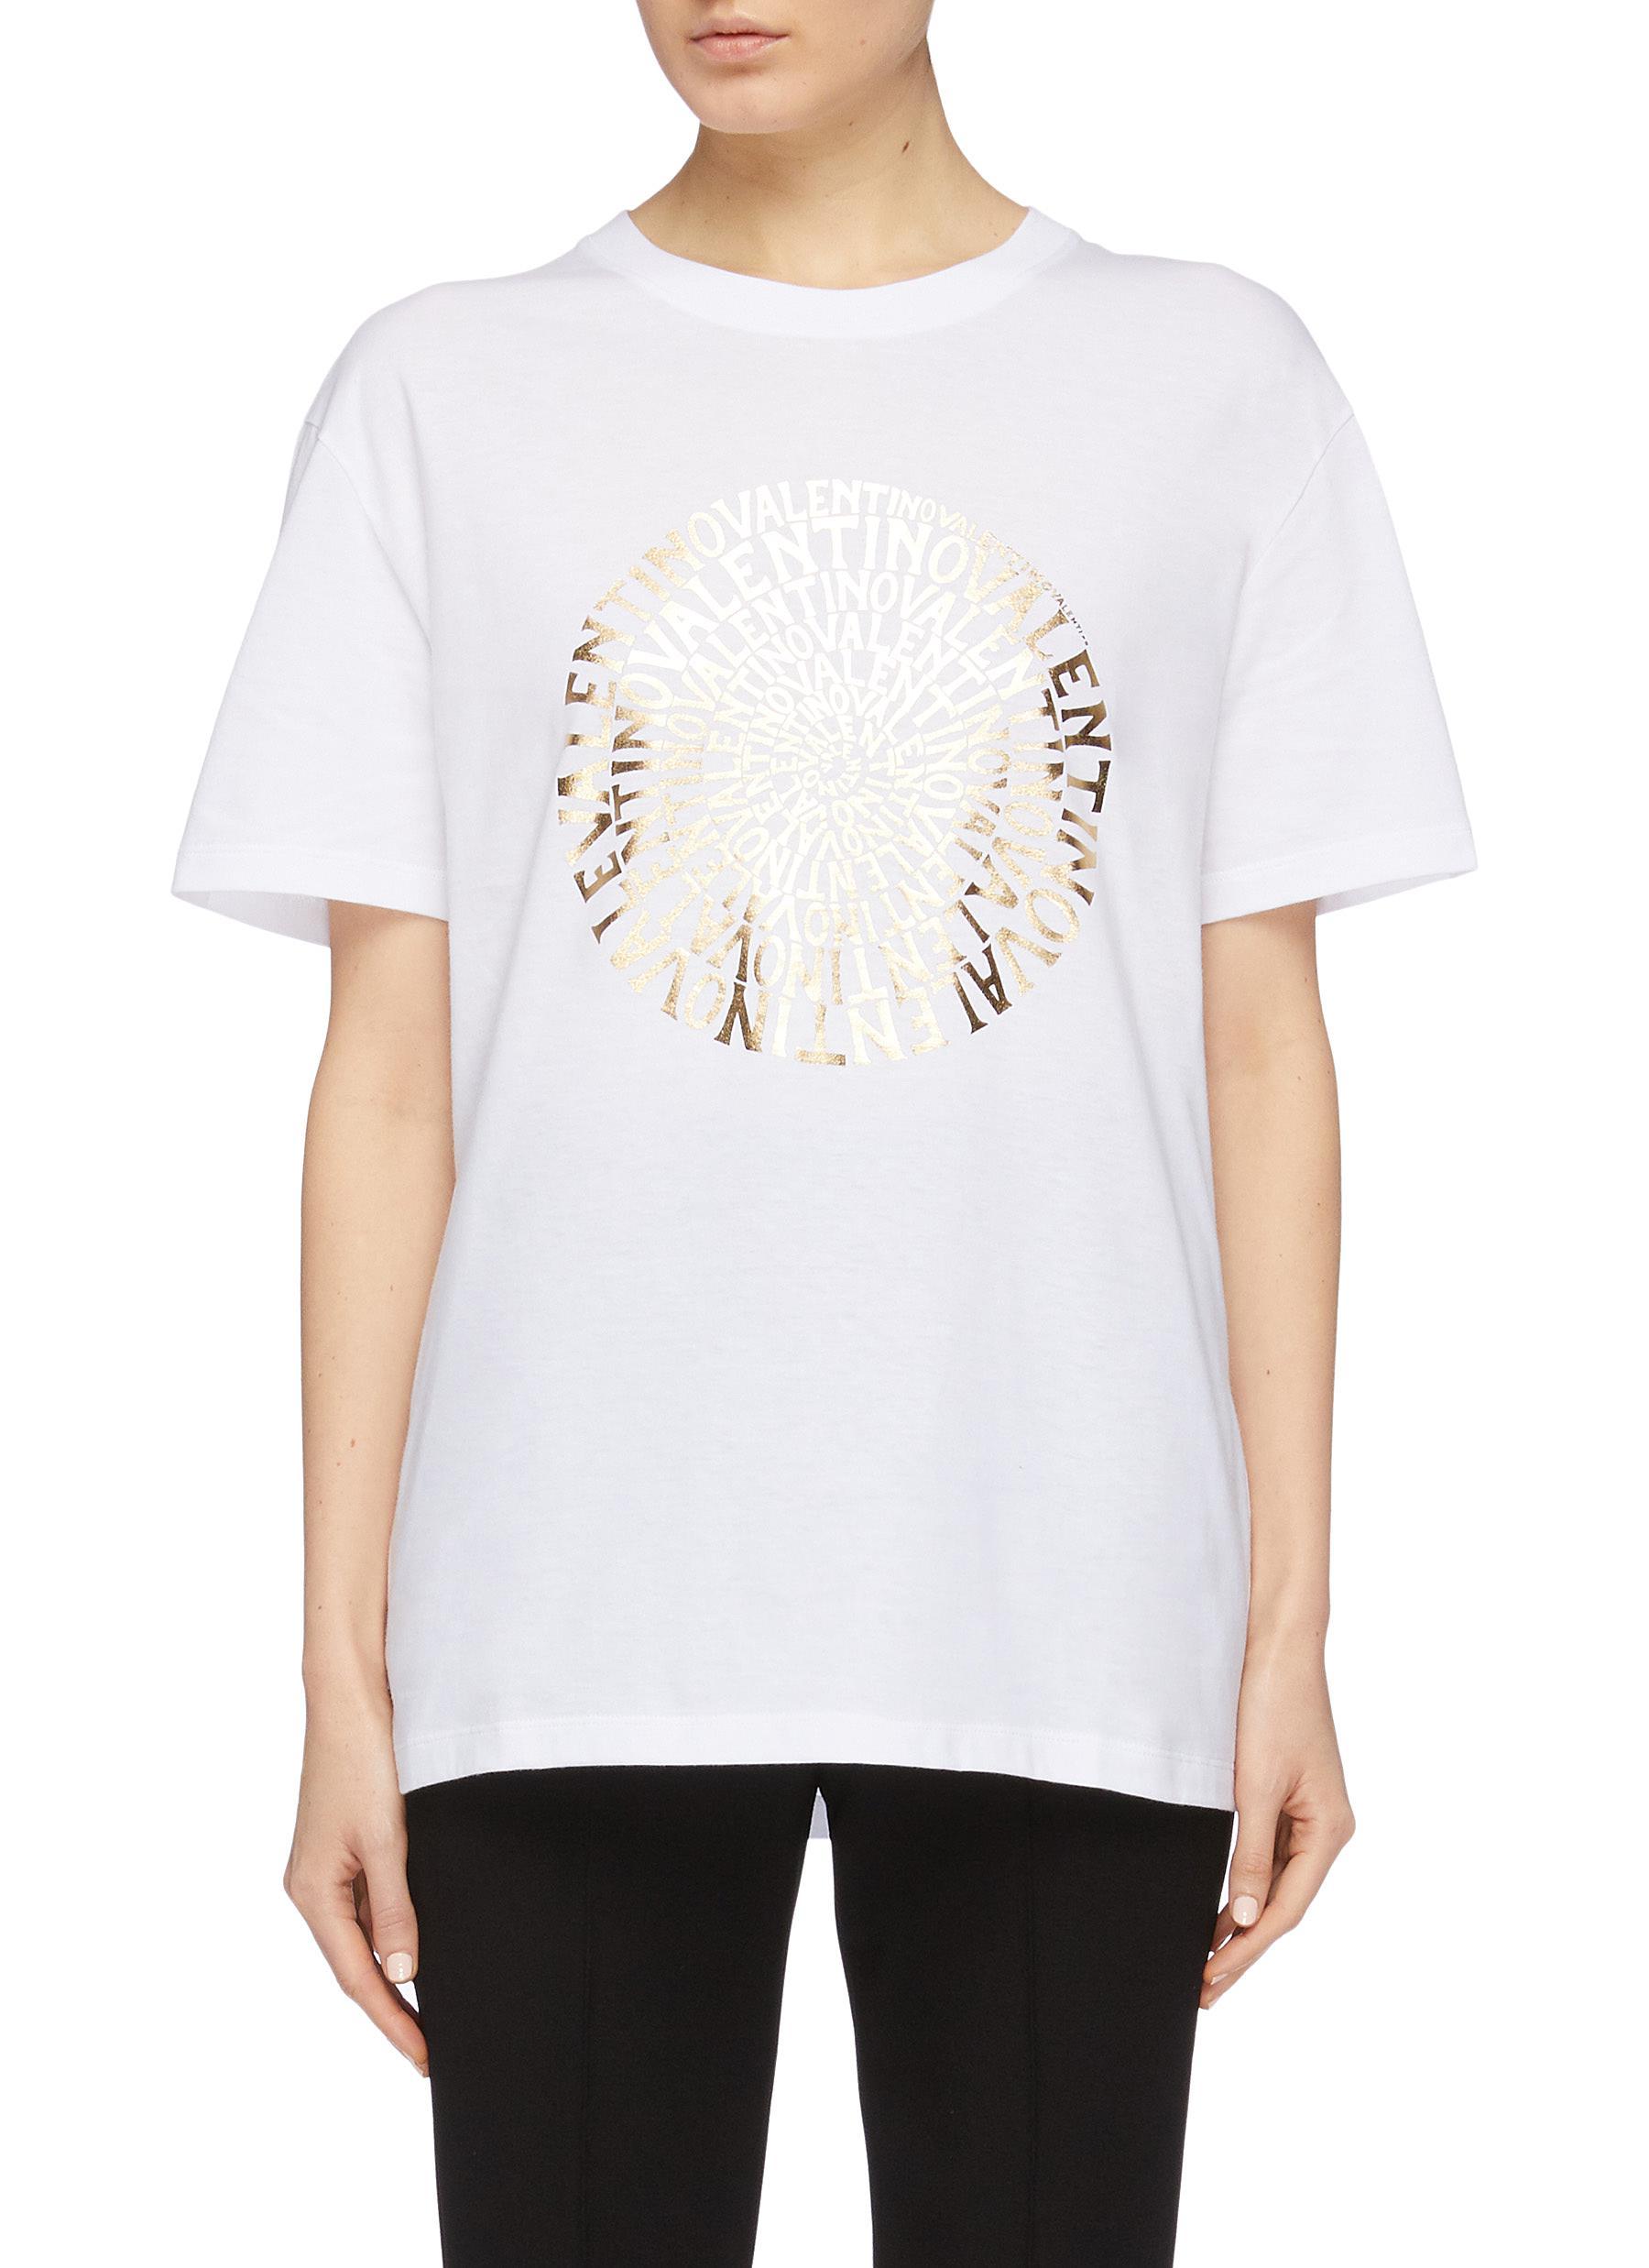 Valentino'vertigo' Print Lane Logo Women Shirt Crawford T wnP8k0O